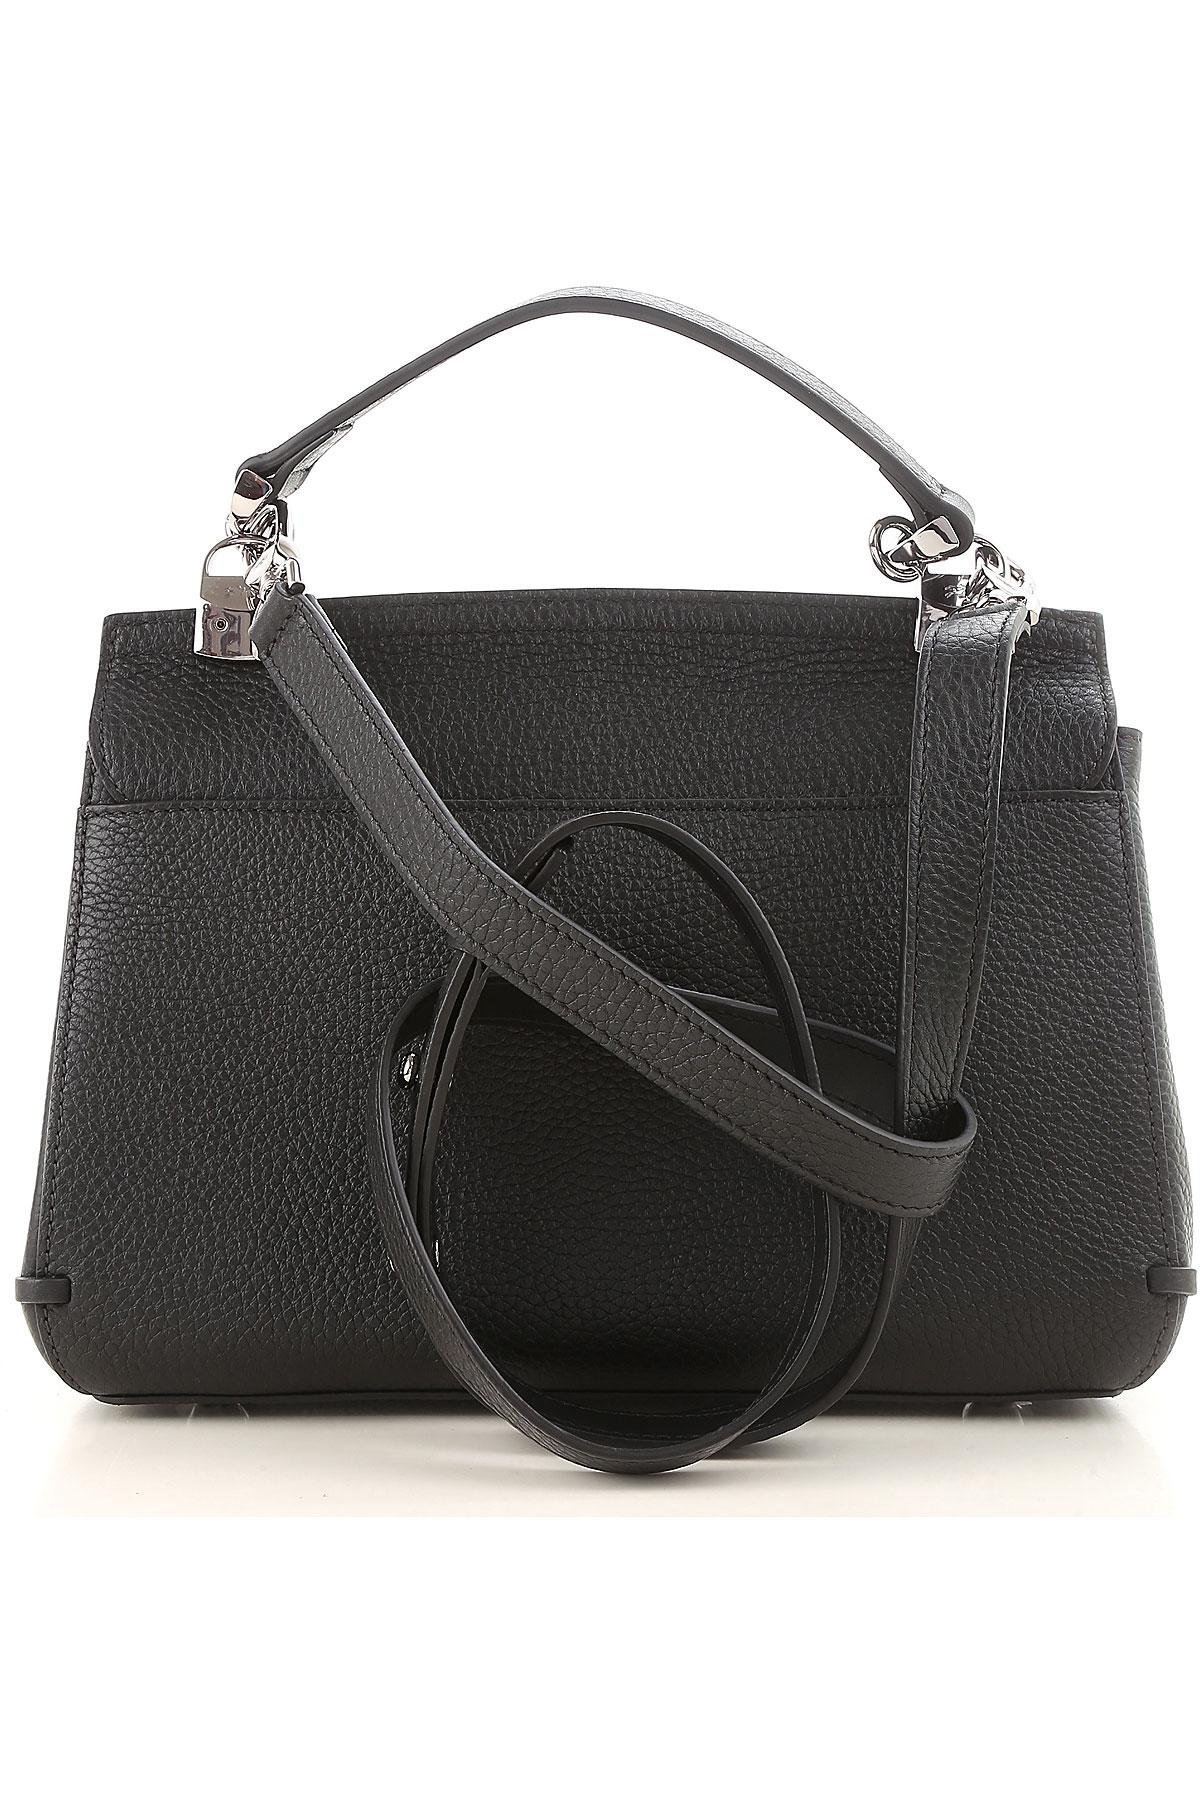 Longchamp Lyst vendita da in Cheap donna nera Borsa a tracolla BqwaBr6